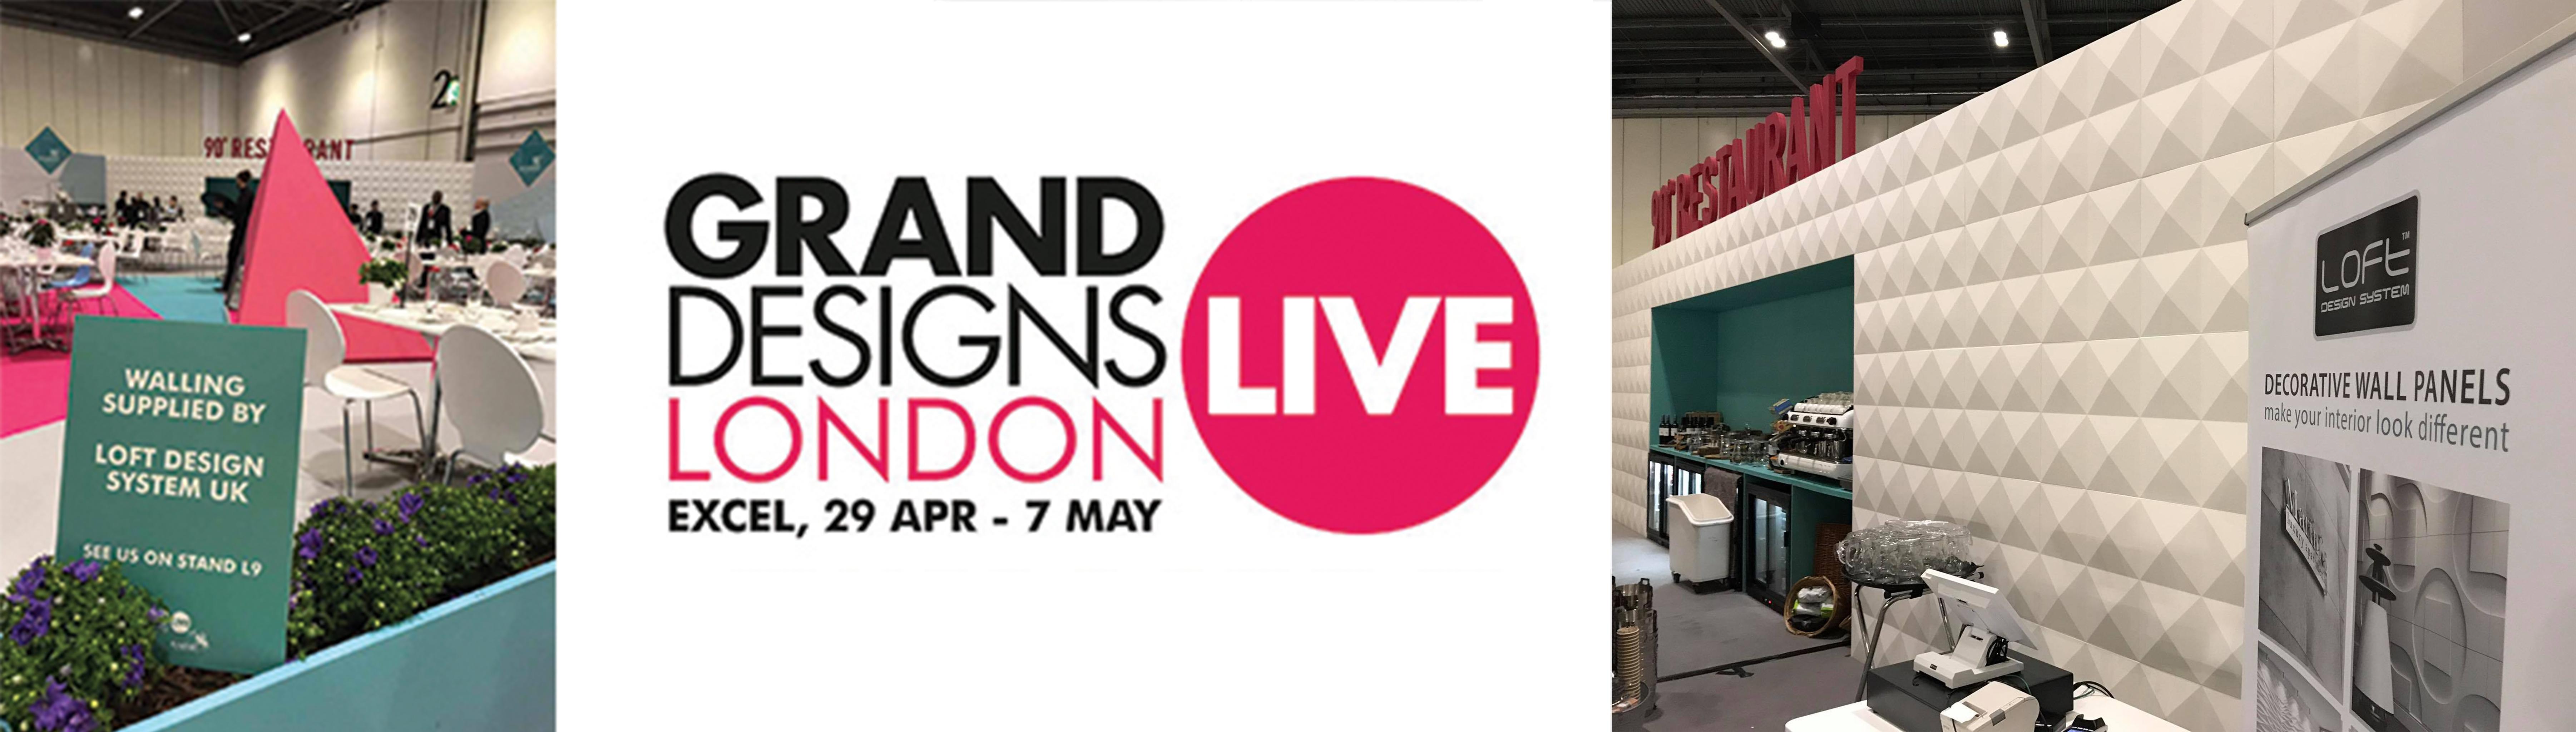 Grand Designs Live London 2017